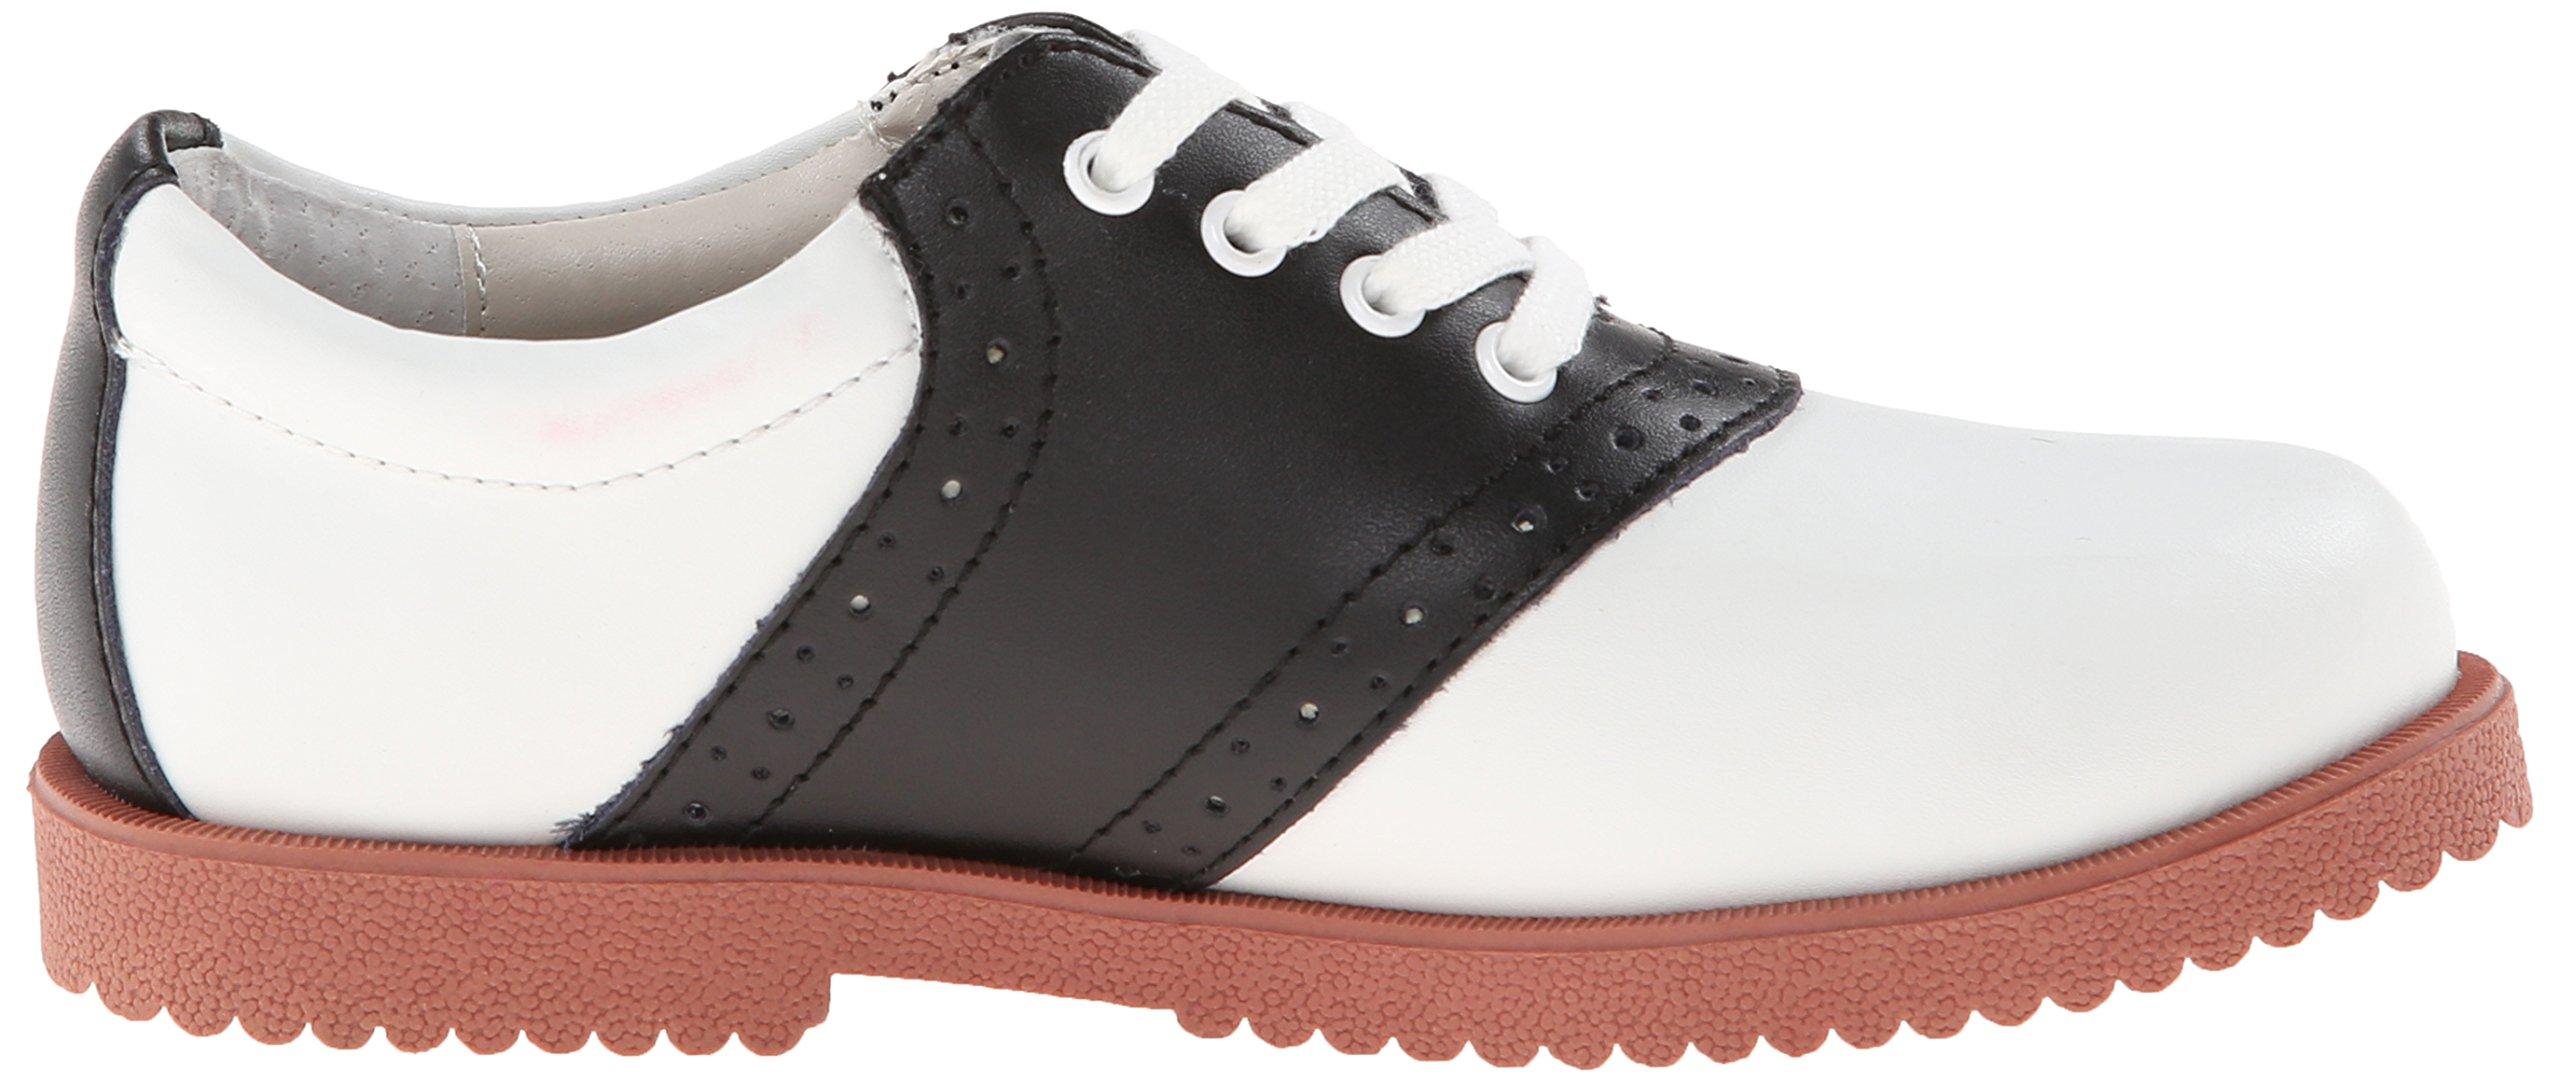 Academie Gear Honor Roll Saddle Shoe (Toddler/Little Kid/Big Kid),White/Black,4 W US Big Kid by Academie Gear (Image #7)